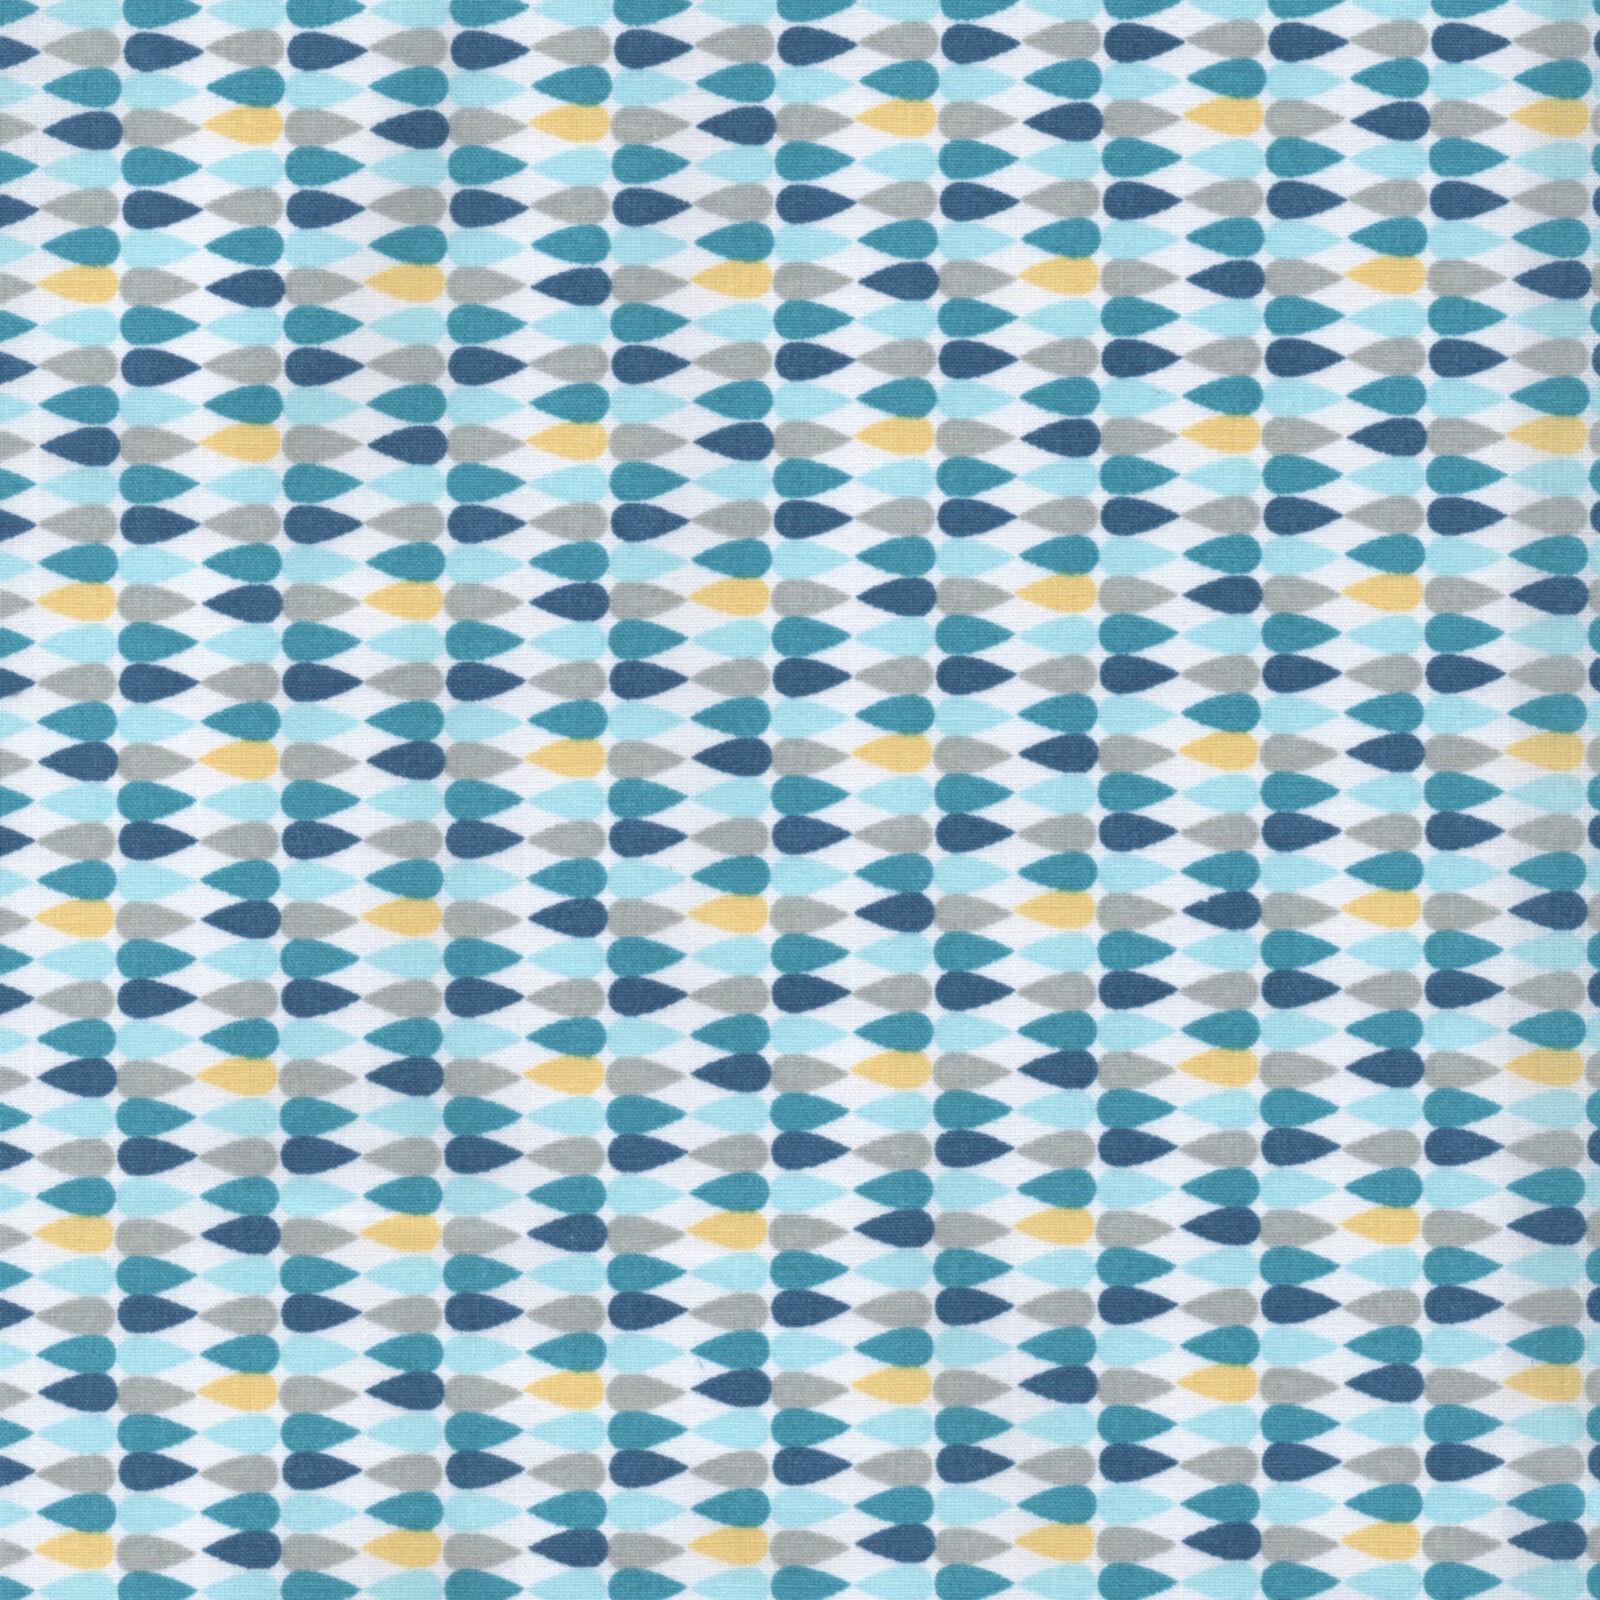 GEOMETRIC PRINTS 100/% COTTON FABRIC yellow grey Le MOTIF 2 TEAL /& AQUA BLUE